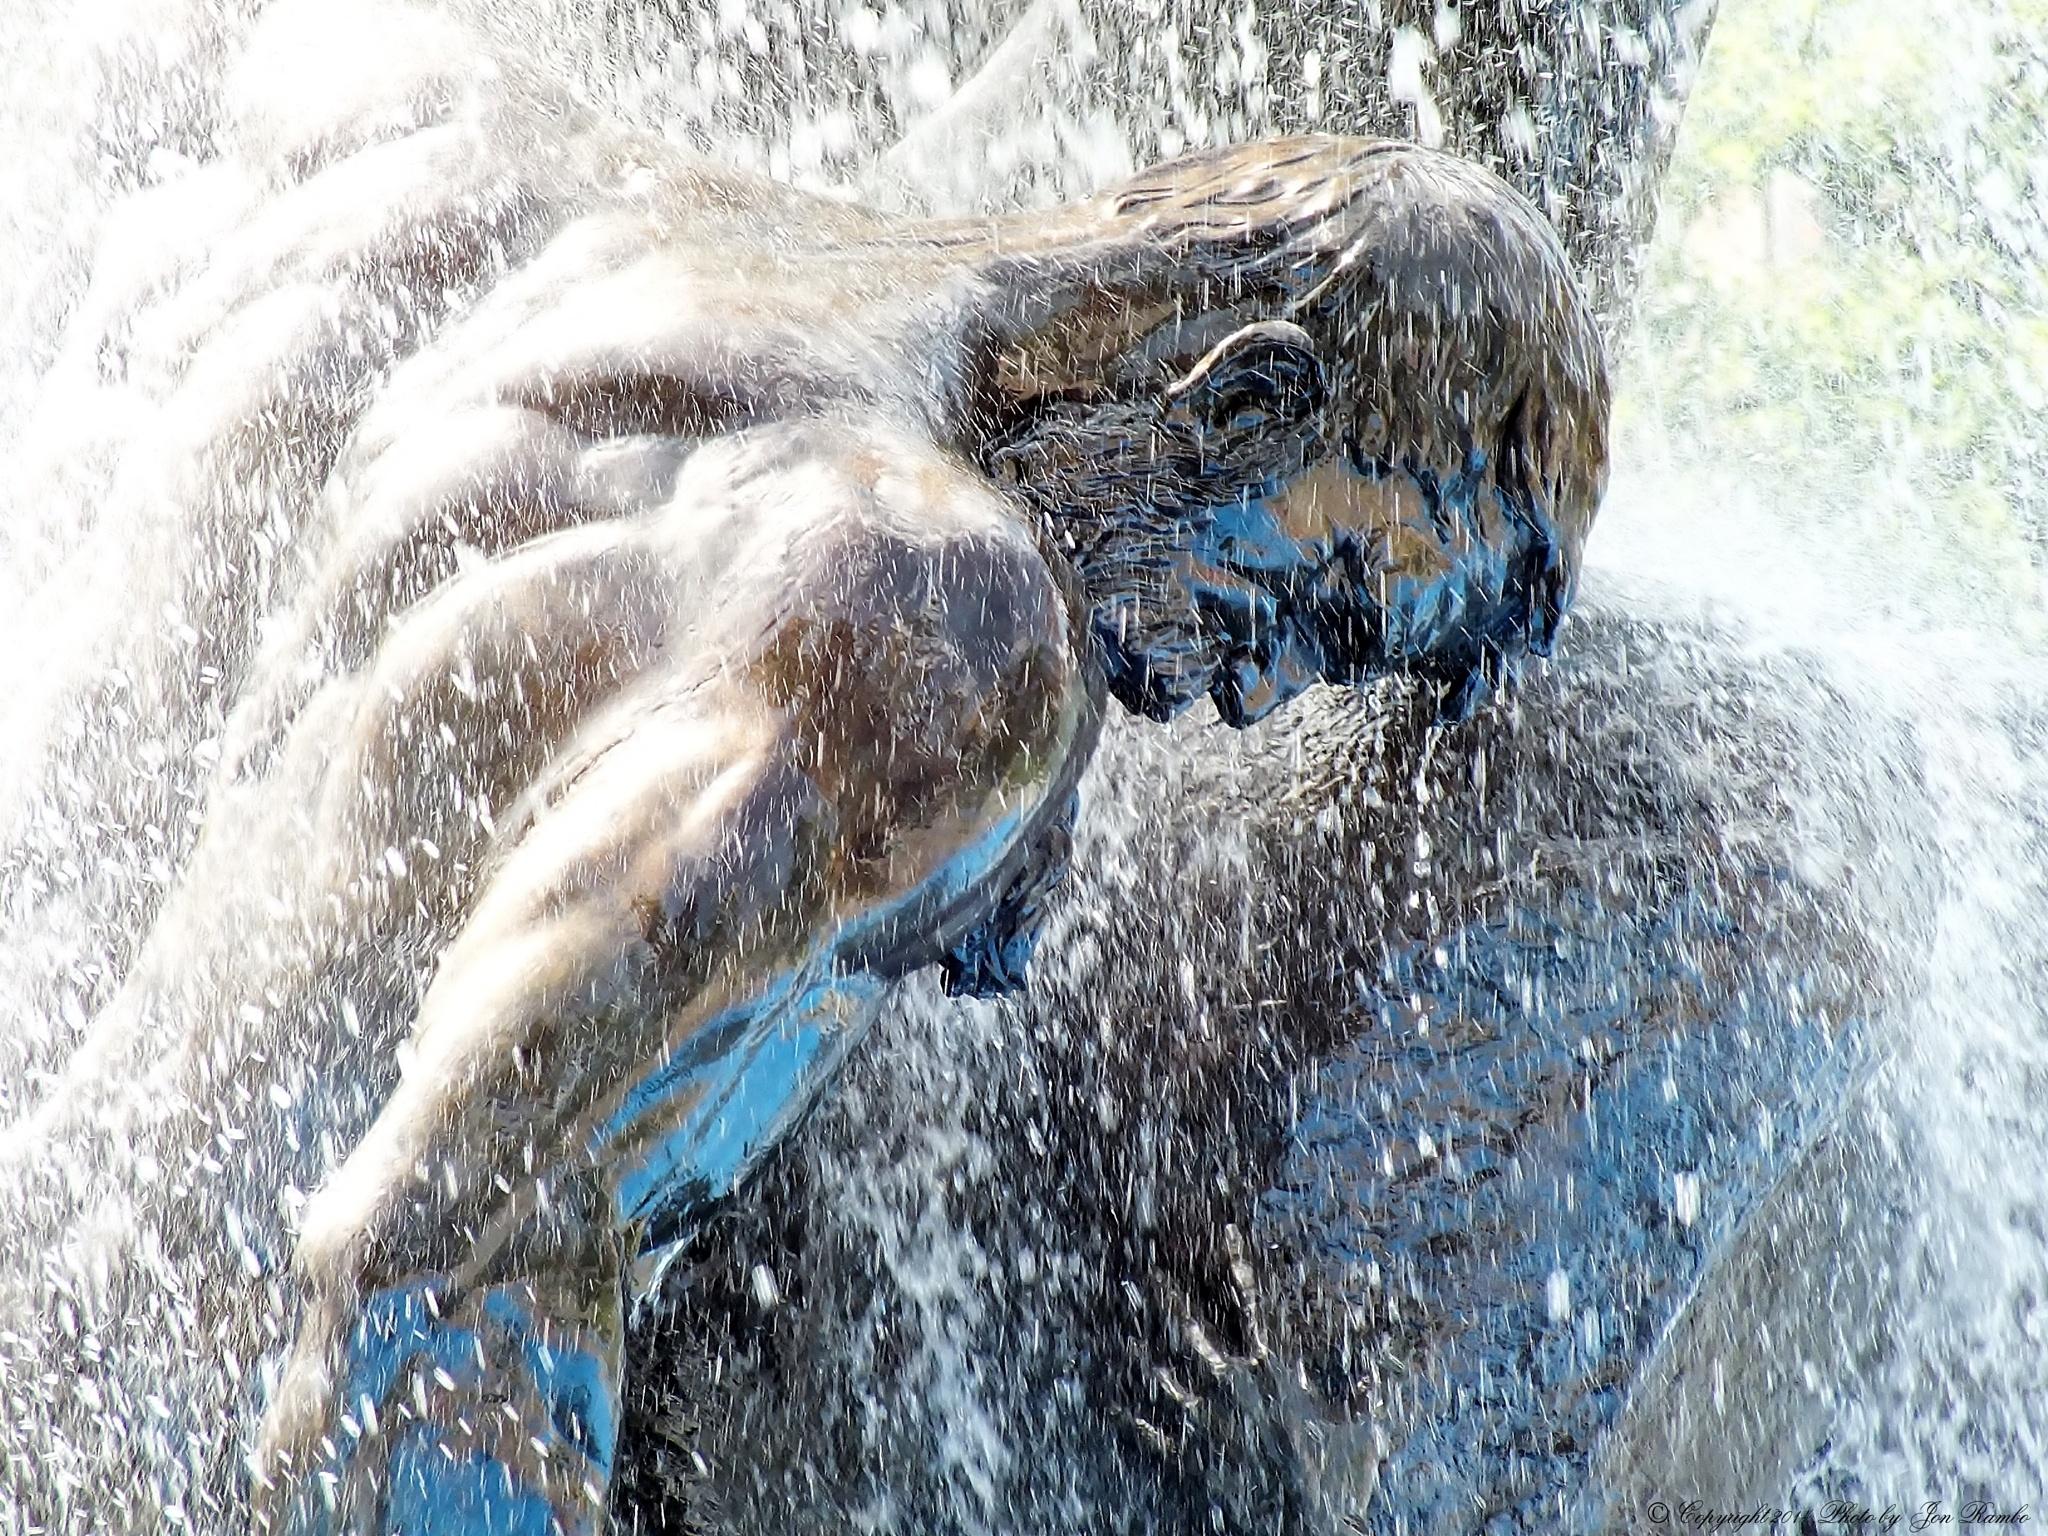 Deluge Fountain (part three) by Mariusz Szmergalski - Jon.Rambo